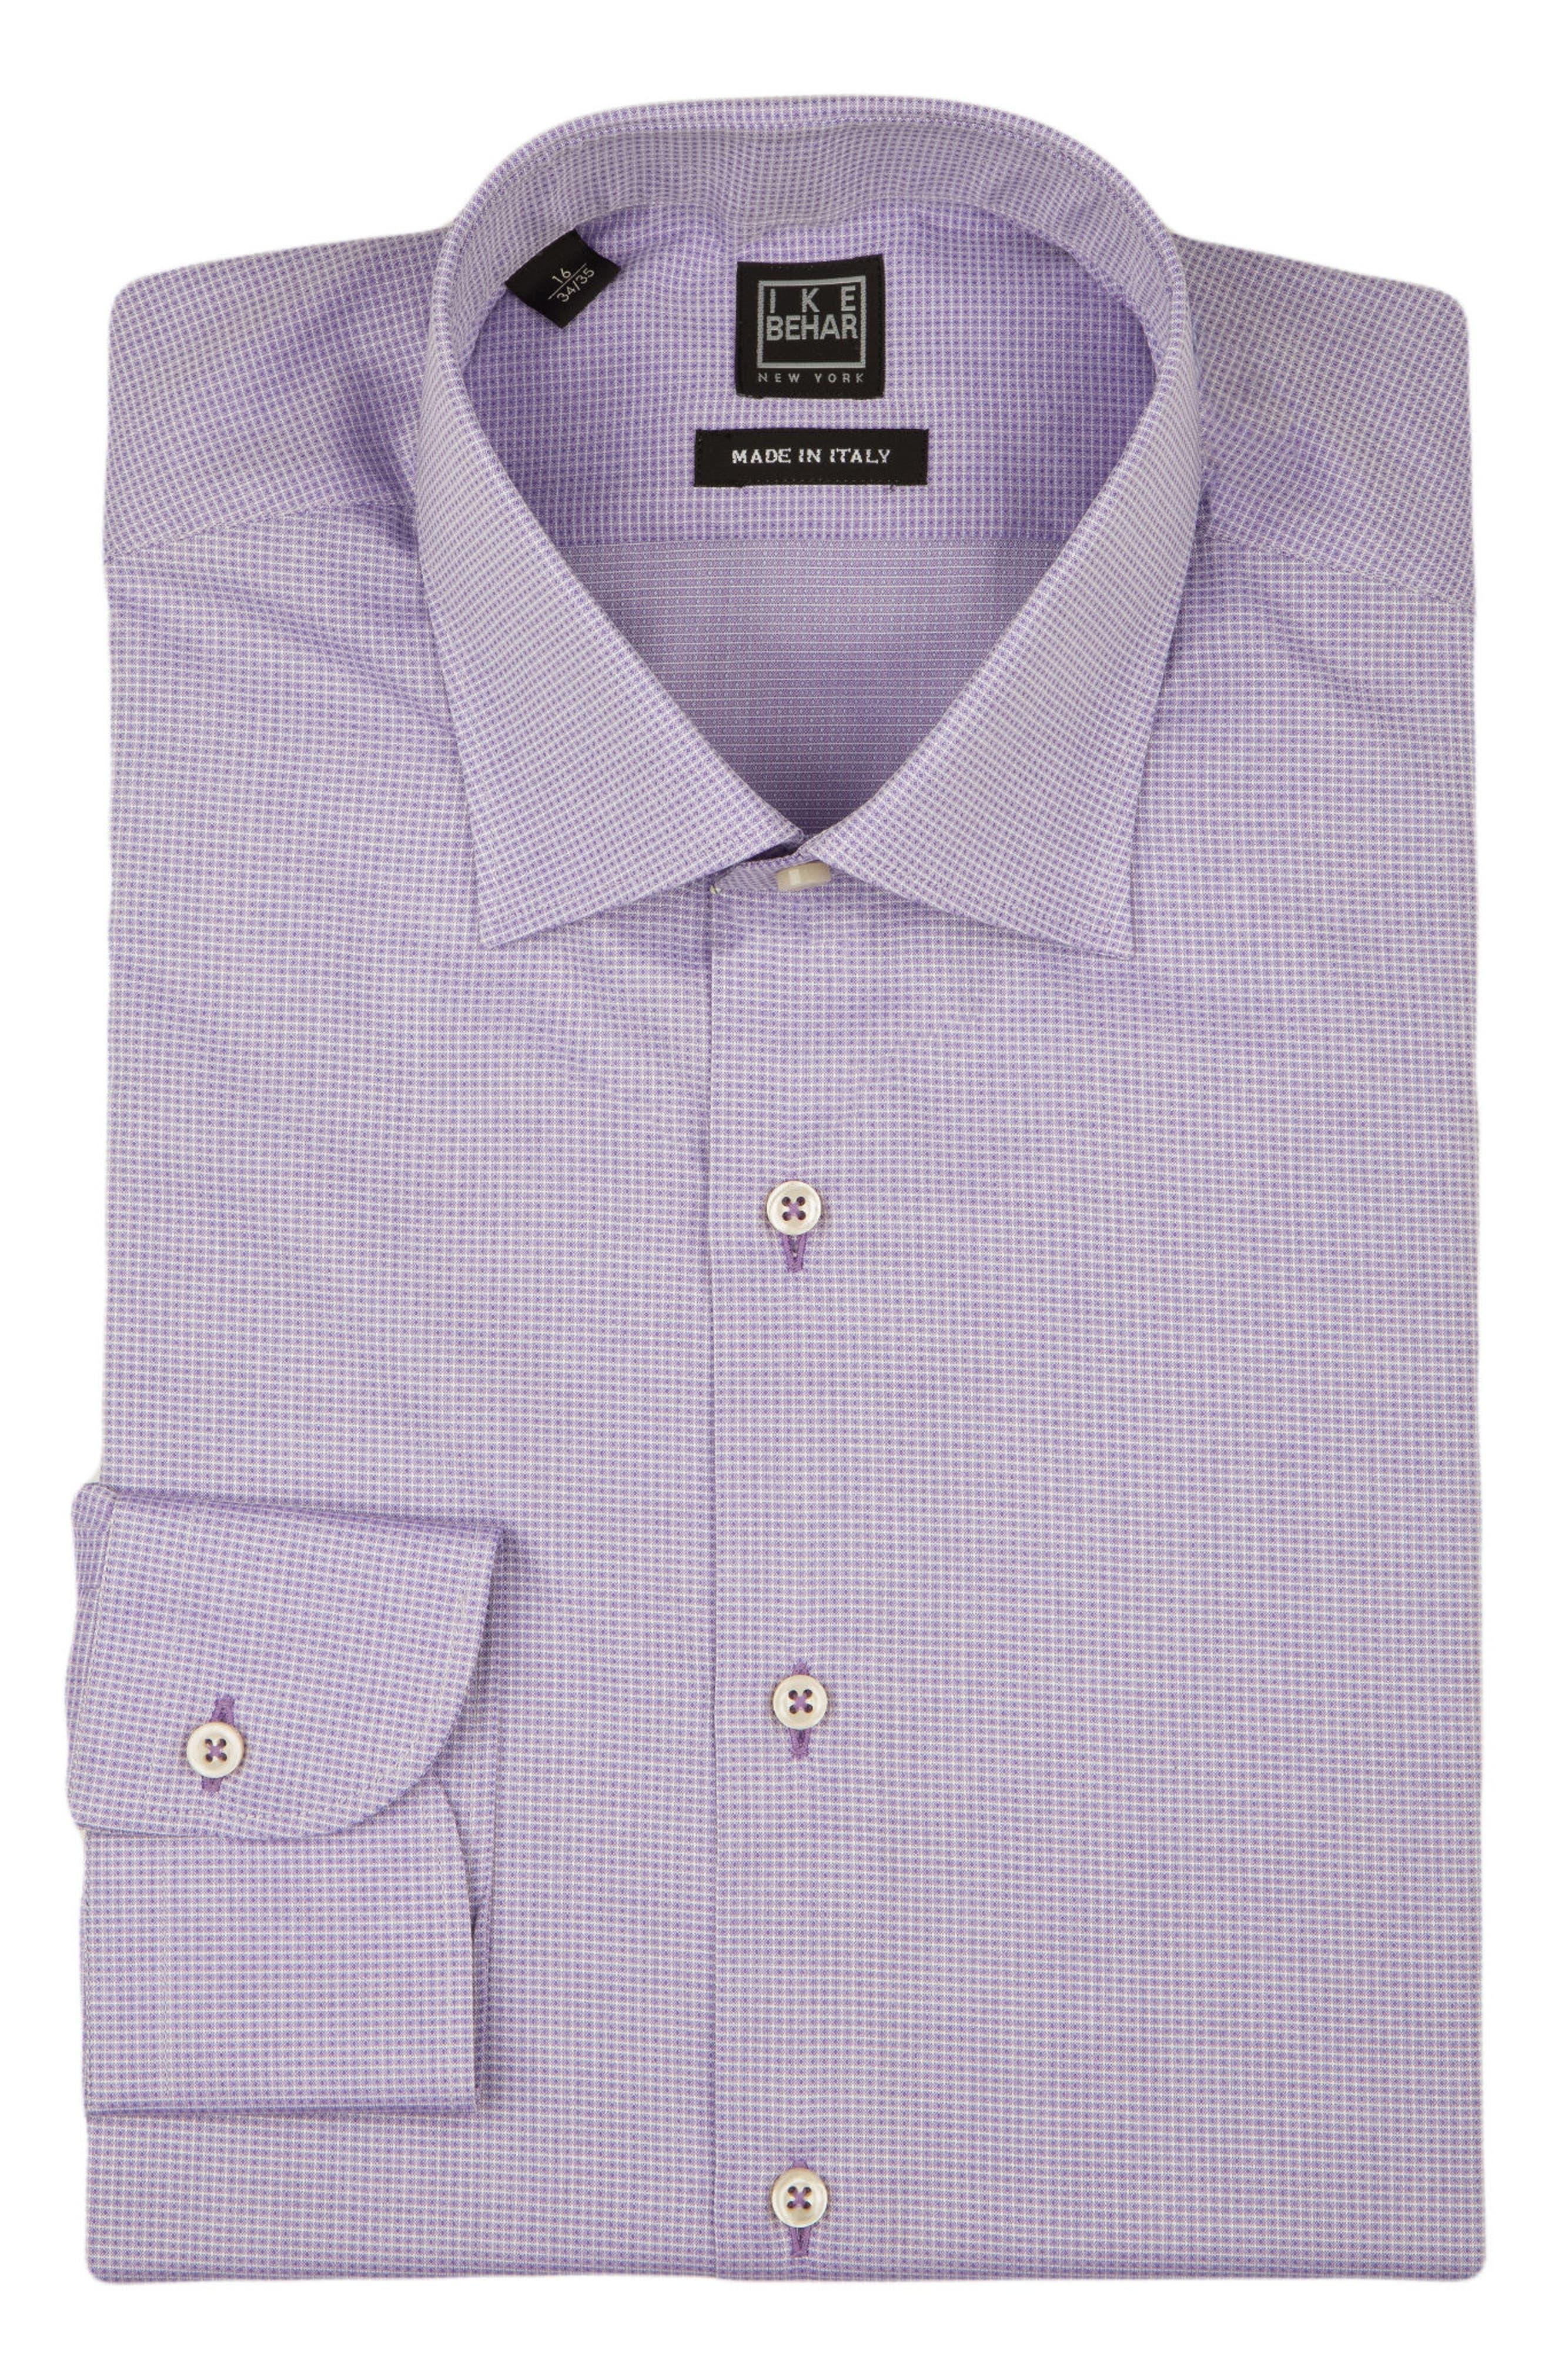 Regular Fit Solid Dress Shirt,                             Alternate thumbnail 5, color,                             500